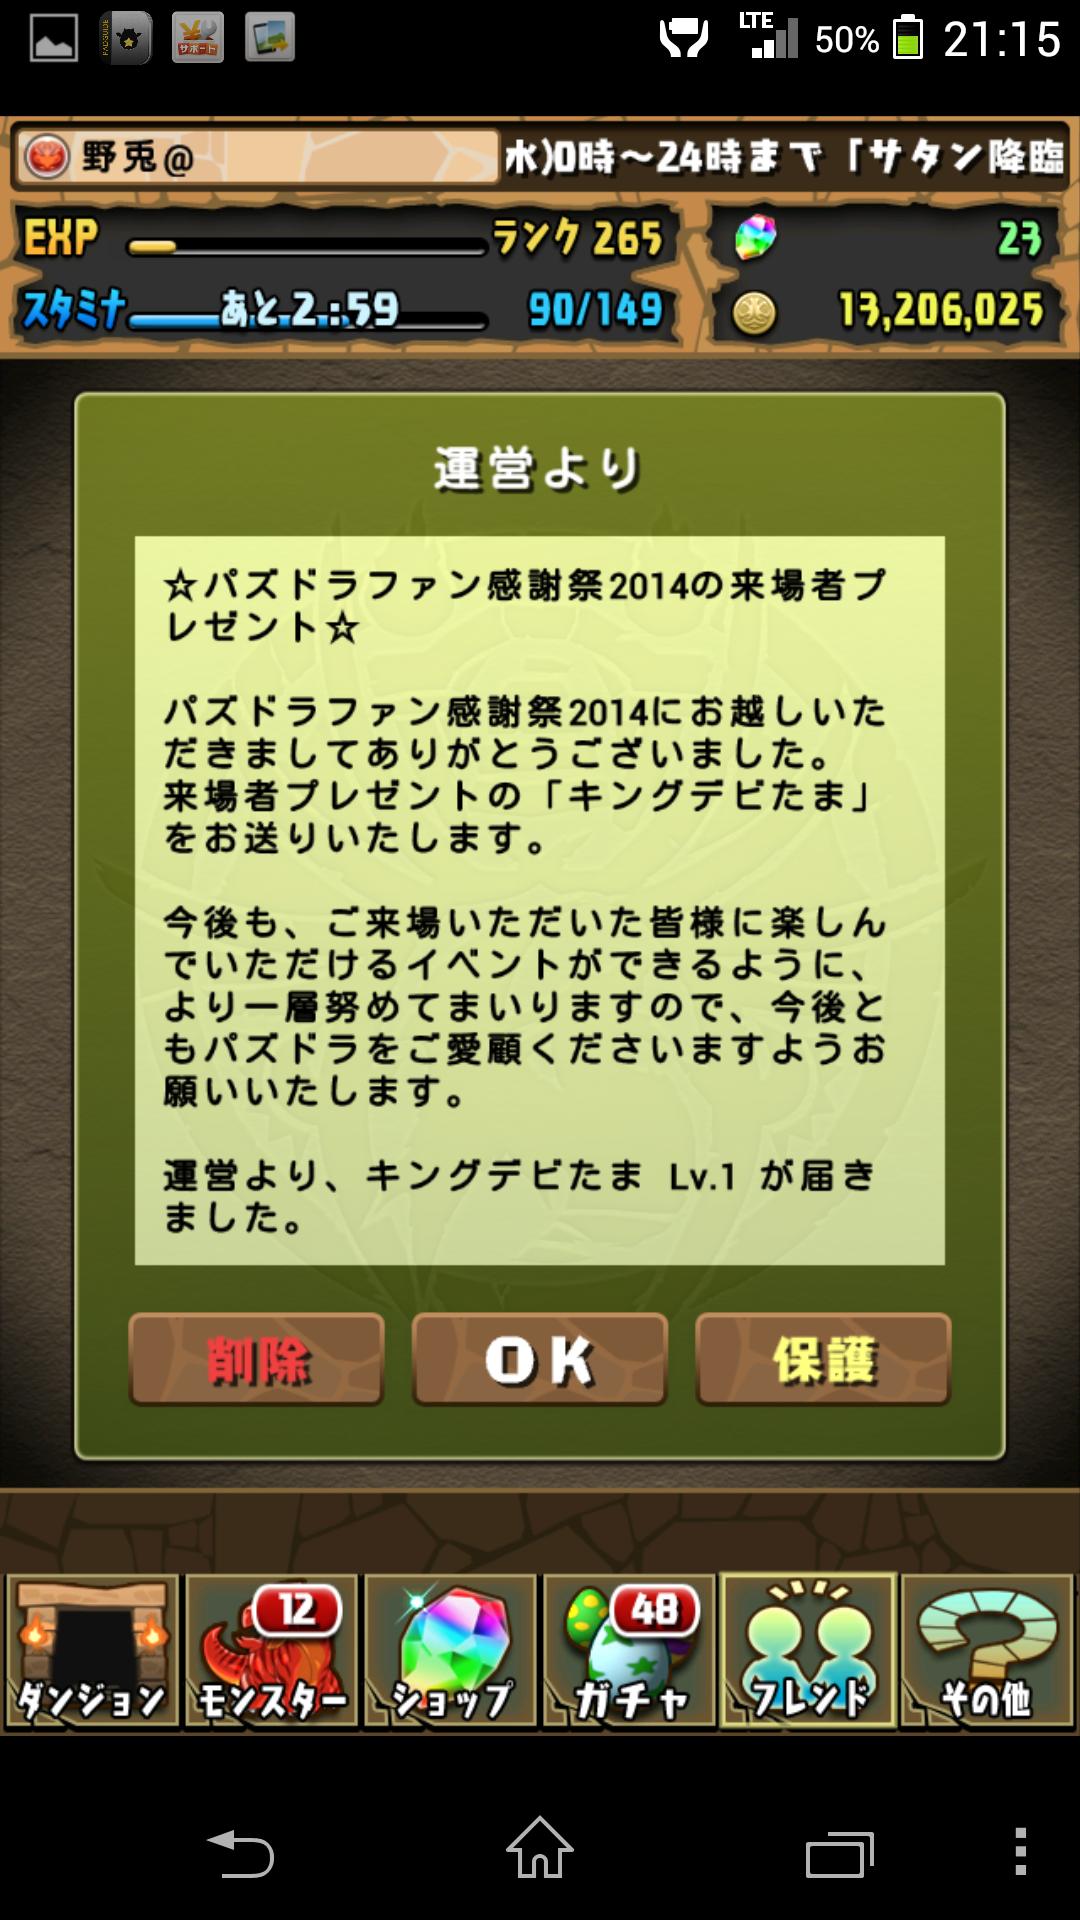 Screenshot_2014-05-28-21-15-31.png